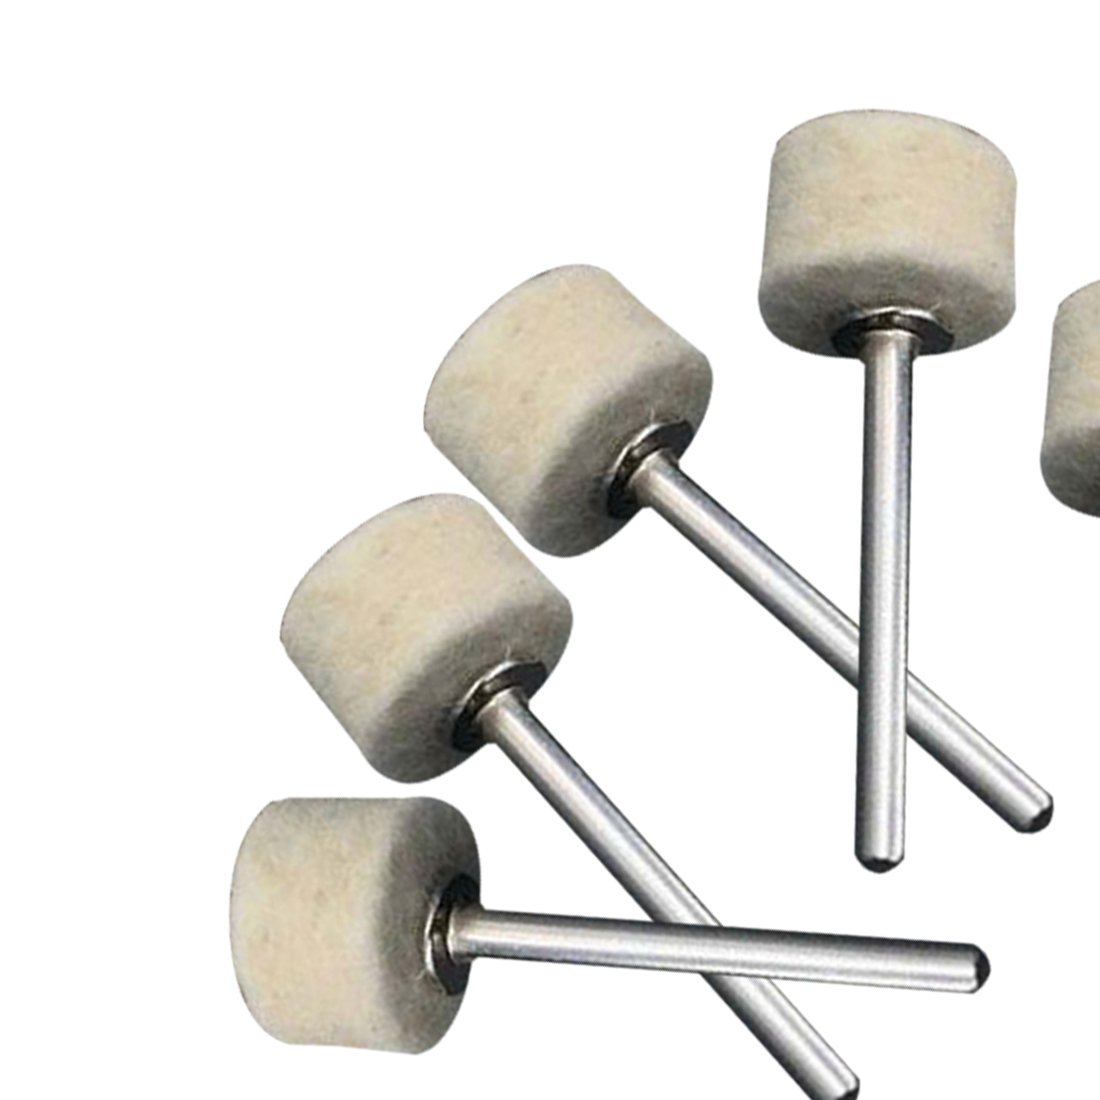 2Pcs 3.2 mm Shanks for Rotary Tool Accessories 13mm 50Pcs Wool Felt Polishing Buffing Wheel Grinding Polishing Pad